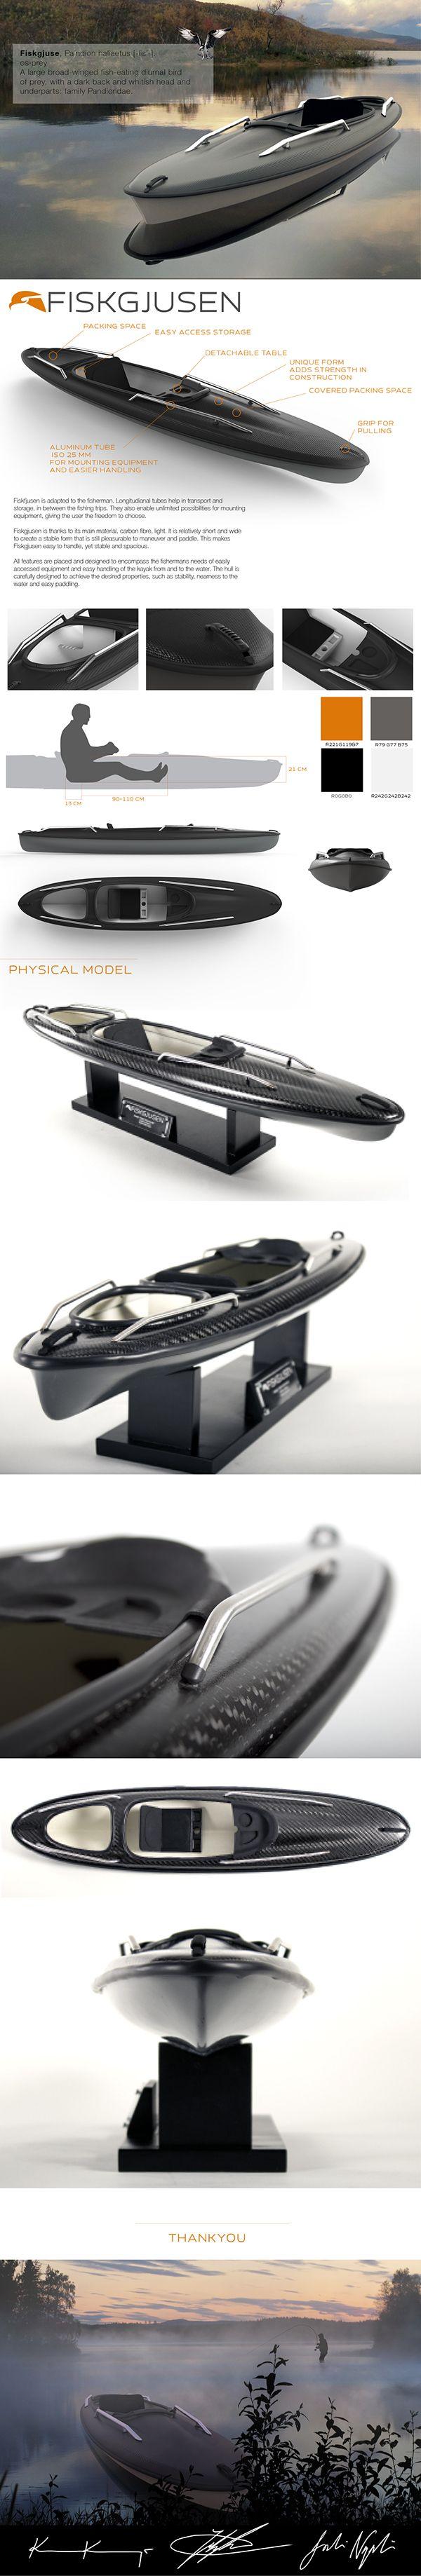 http://www.industrialdesignserved.com/gallery/Fiskgjusen-Product-design/15520817